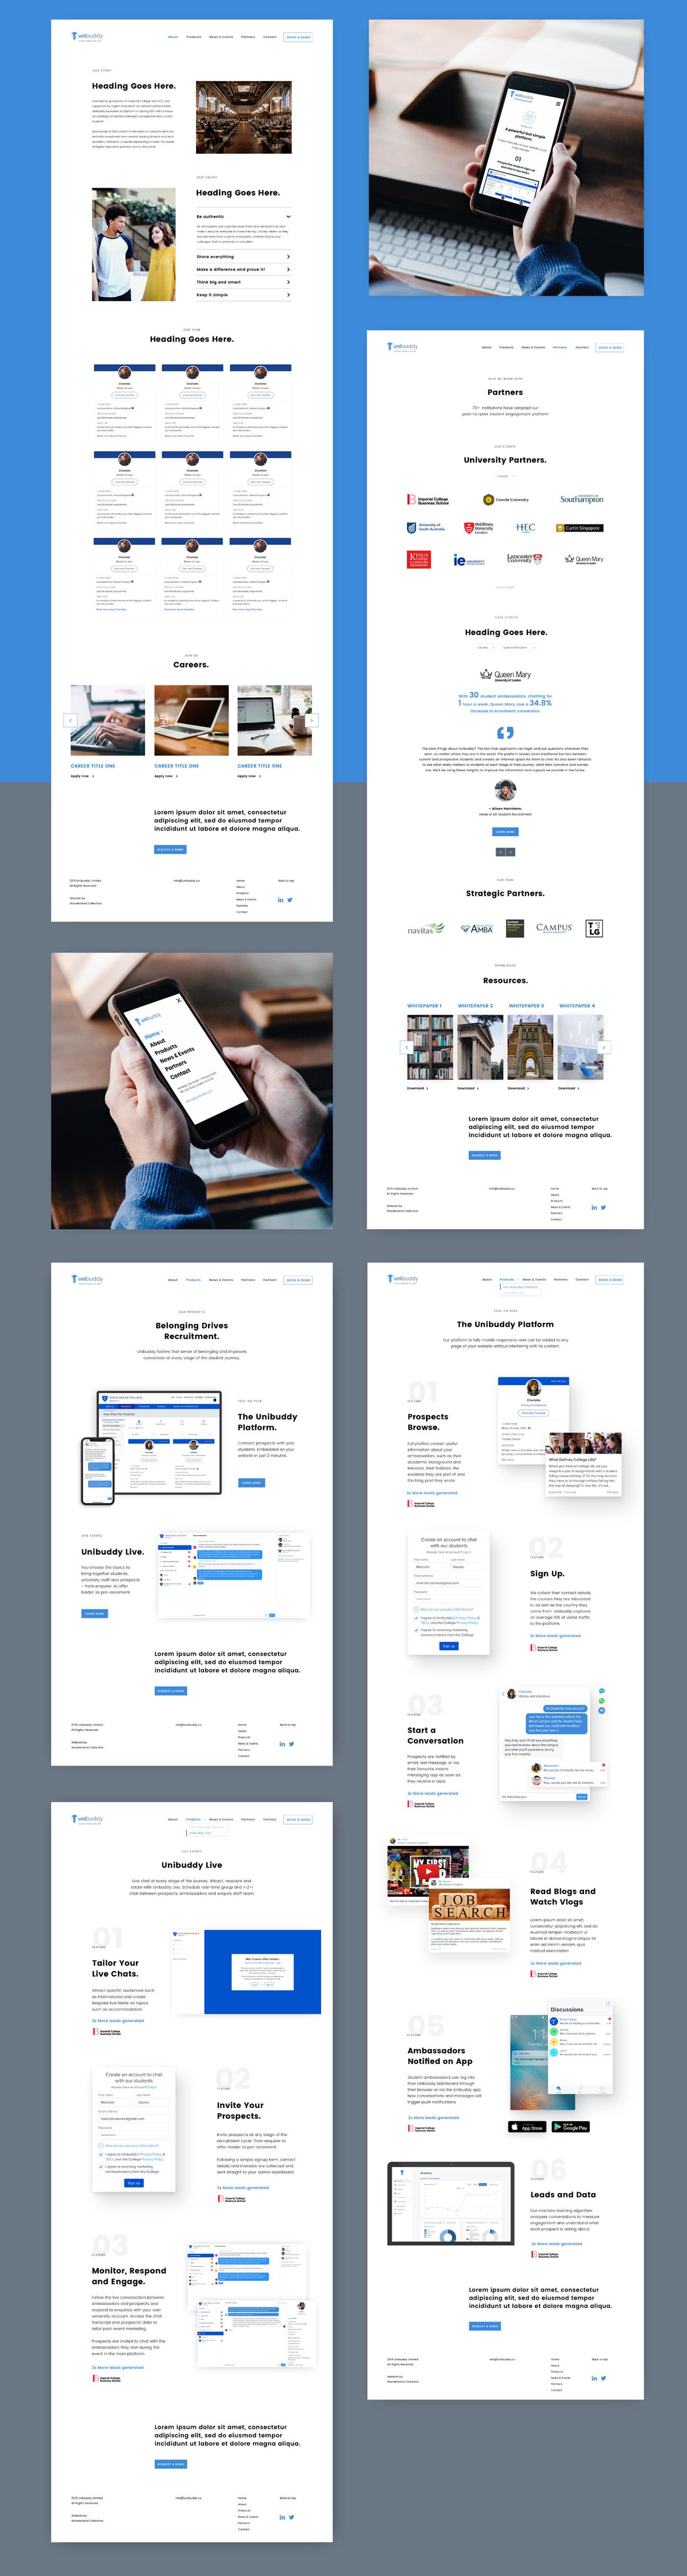 Webdesign UI ux Education product website University Recruitment software website Website Design Clean Design animation effects